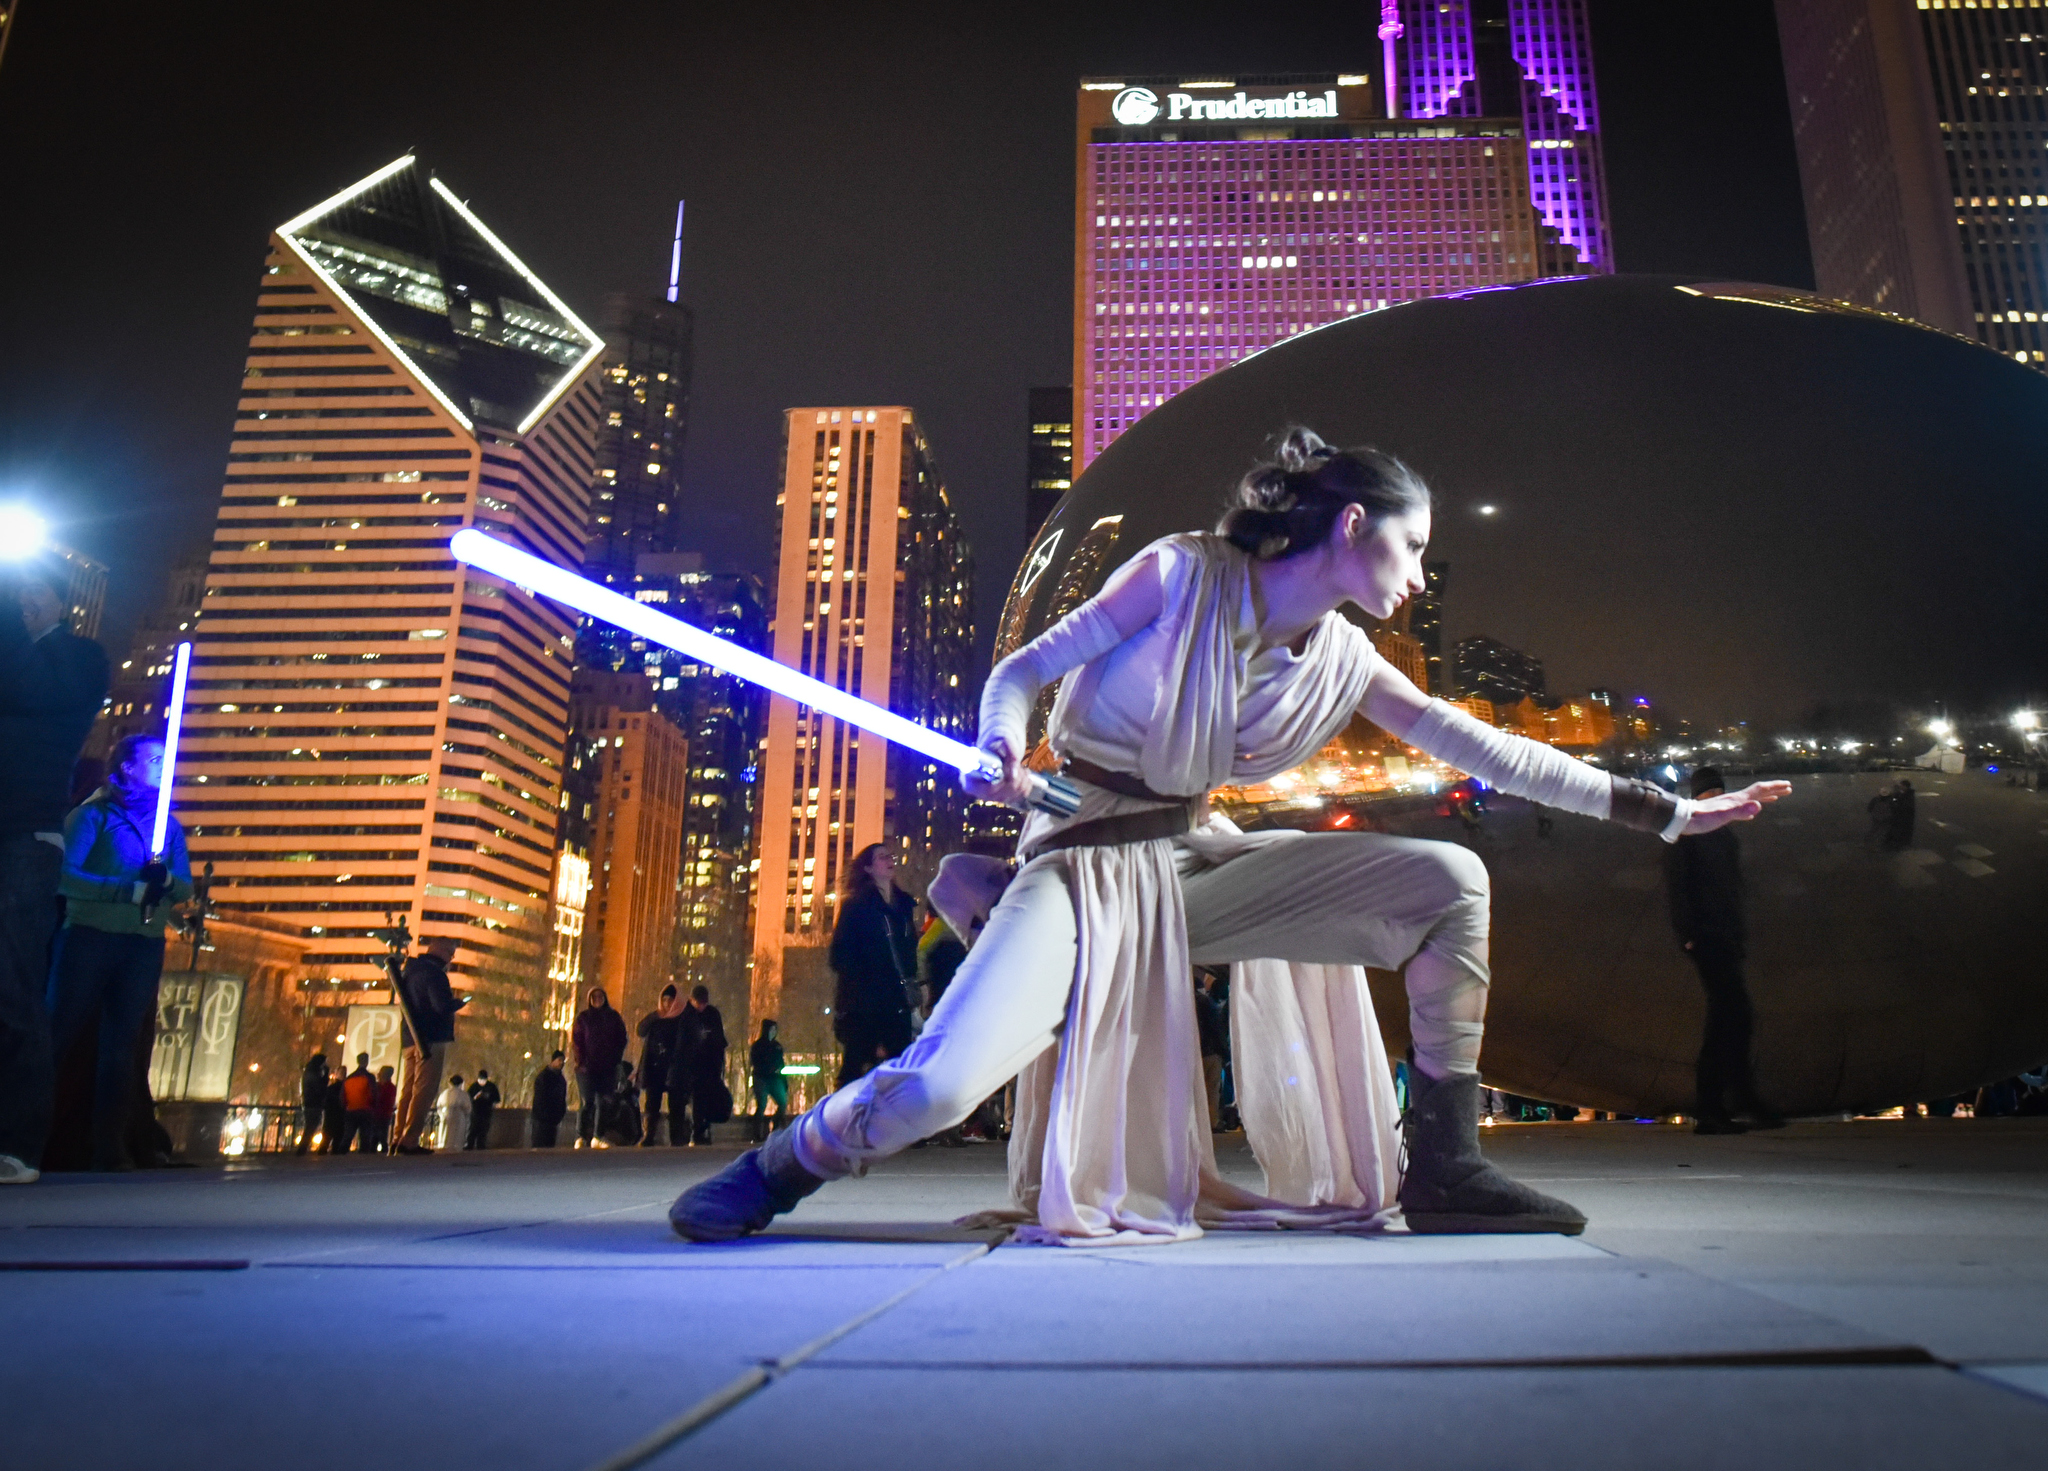 2019.04.14 - Star Wars Celebration Chicago 288905.JPG